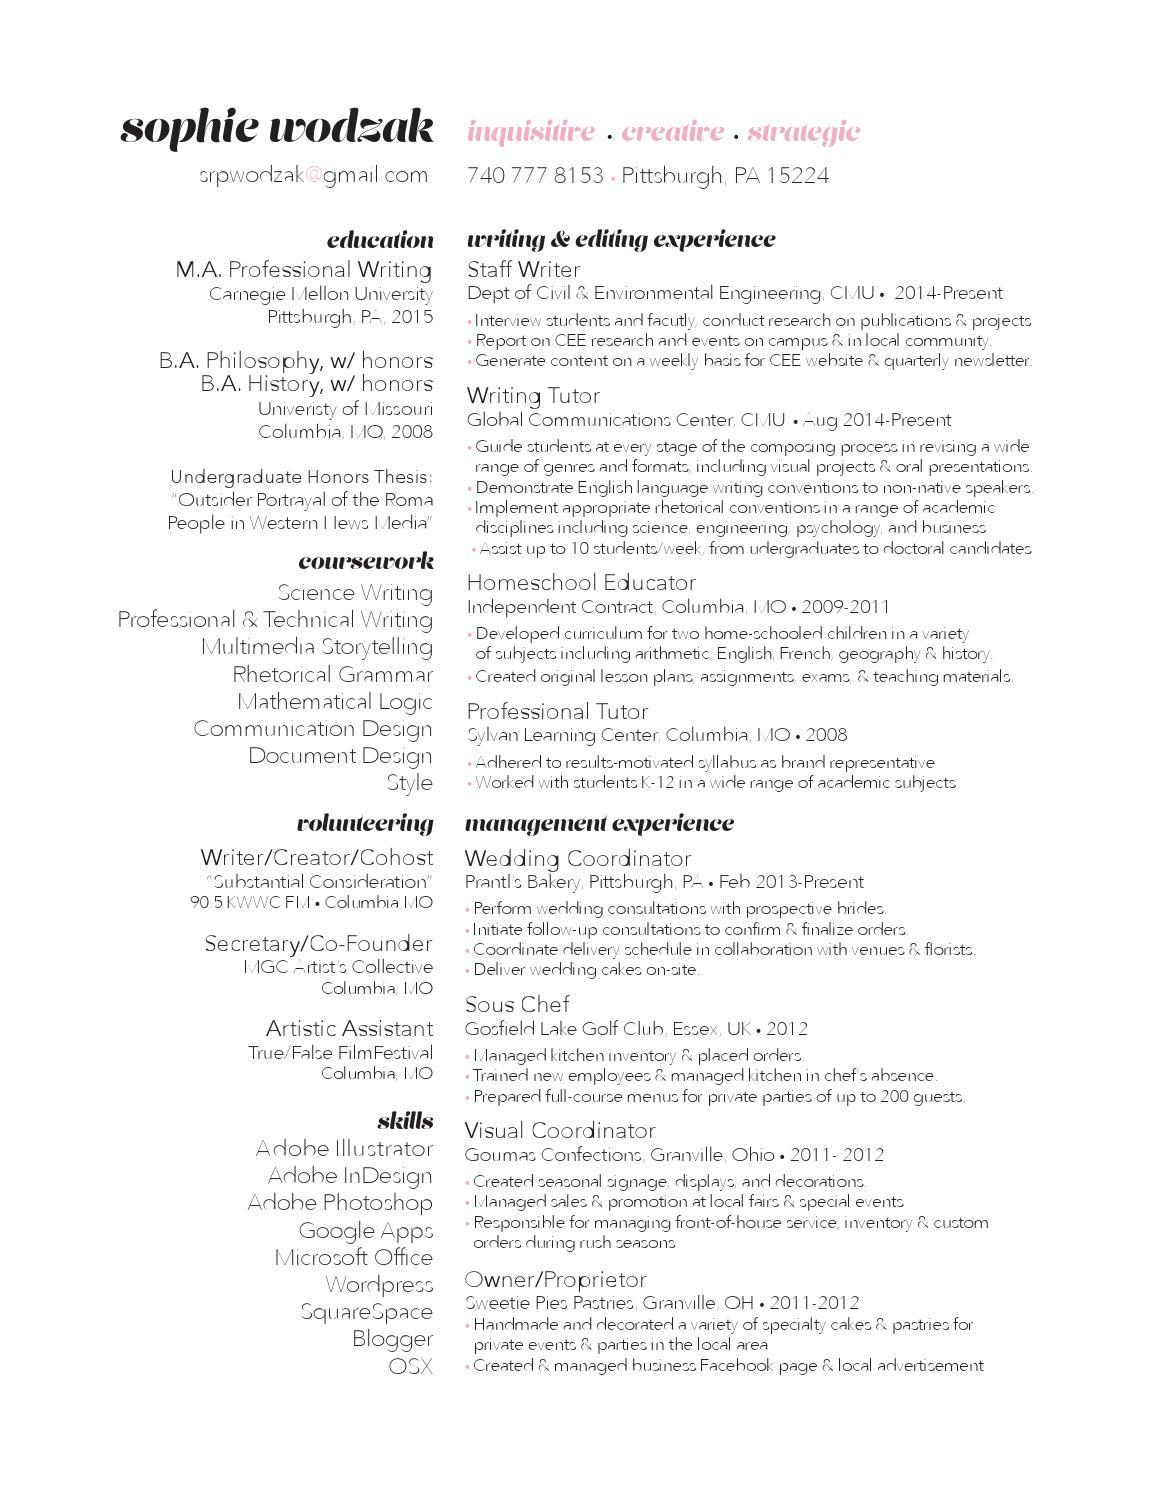 Design resume by srpwodzak - issuu